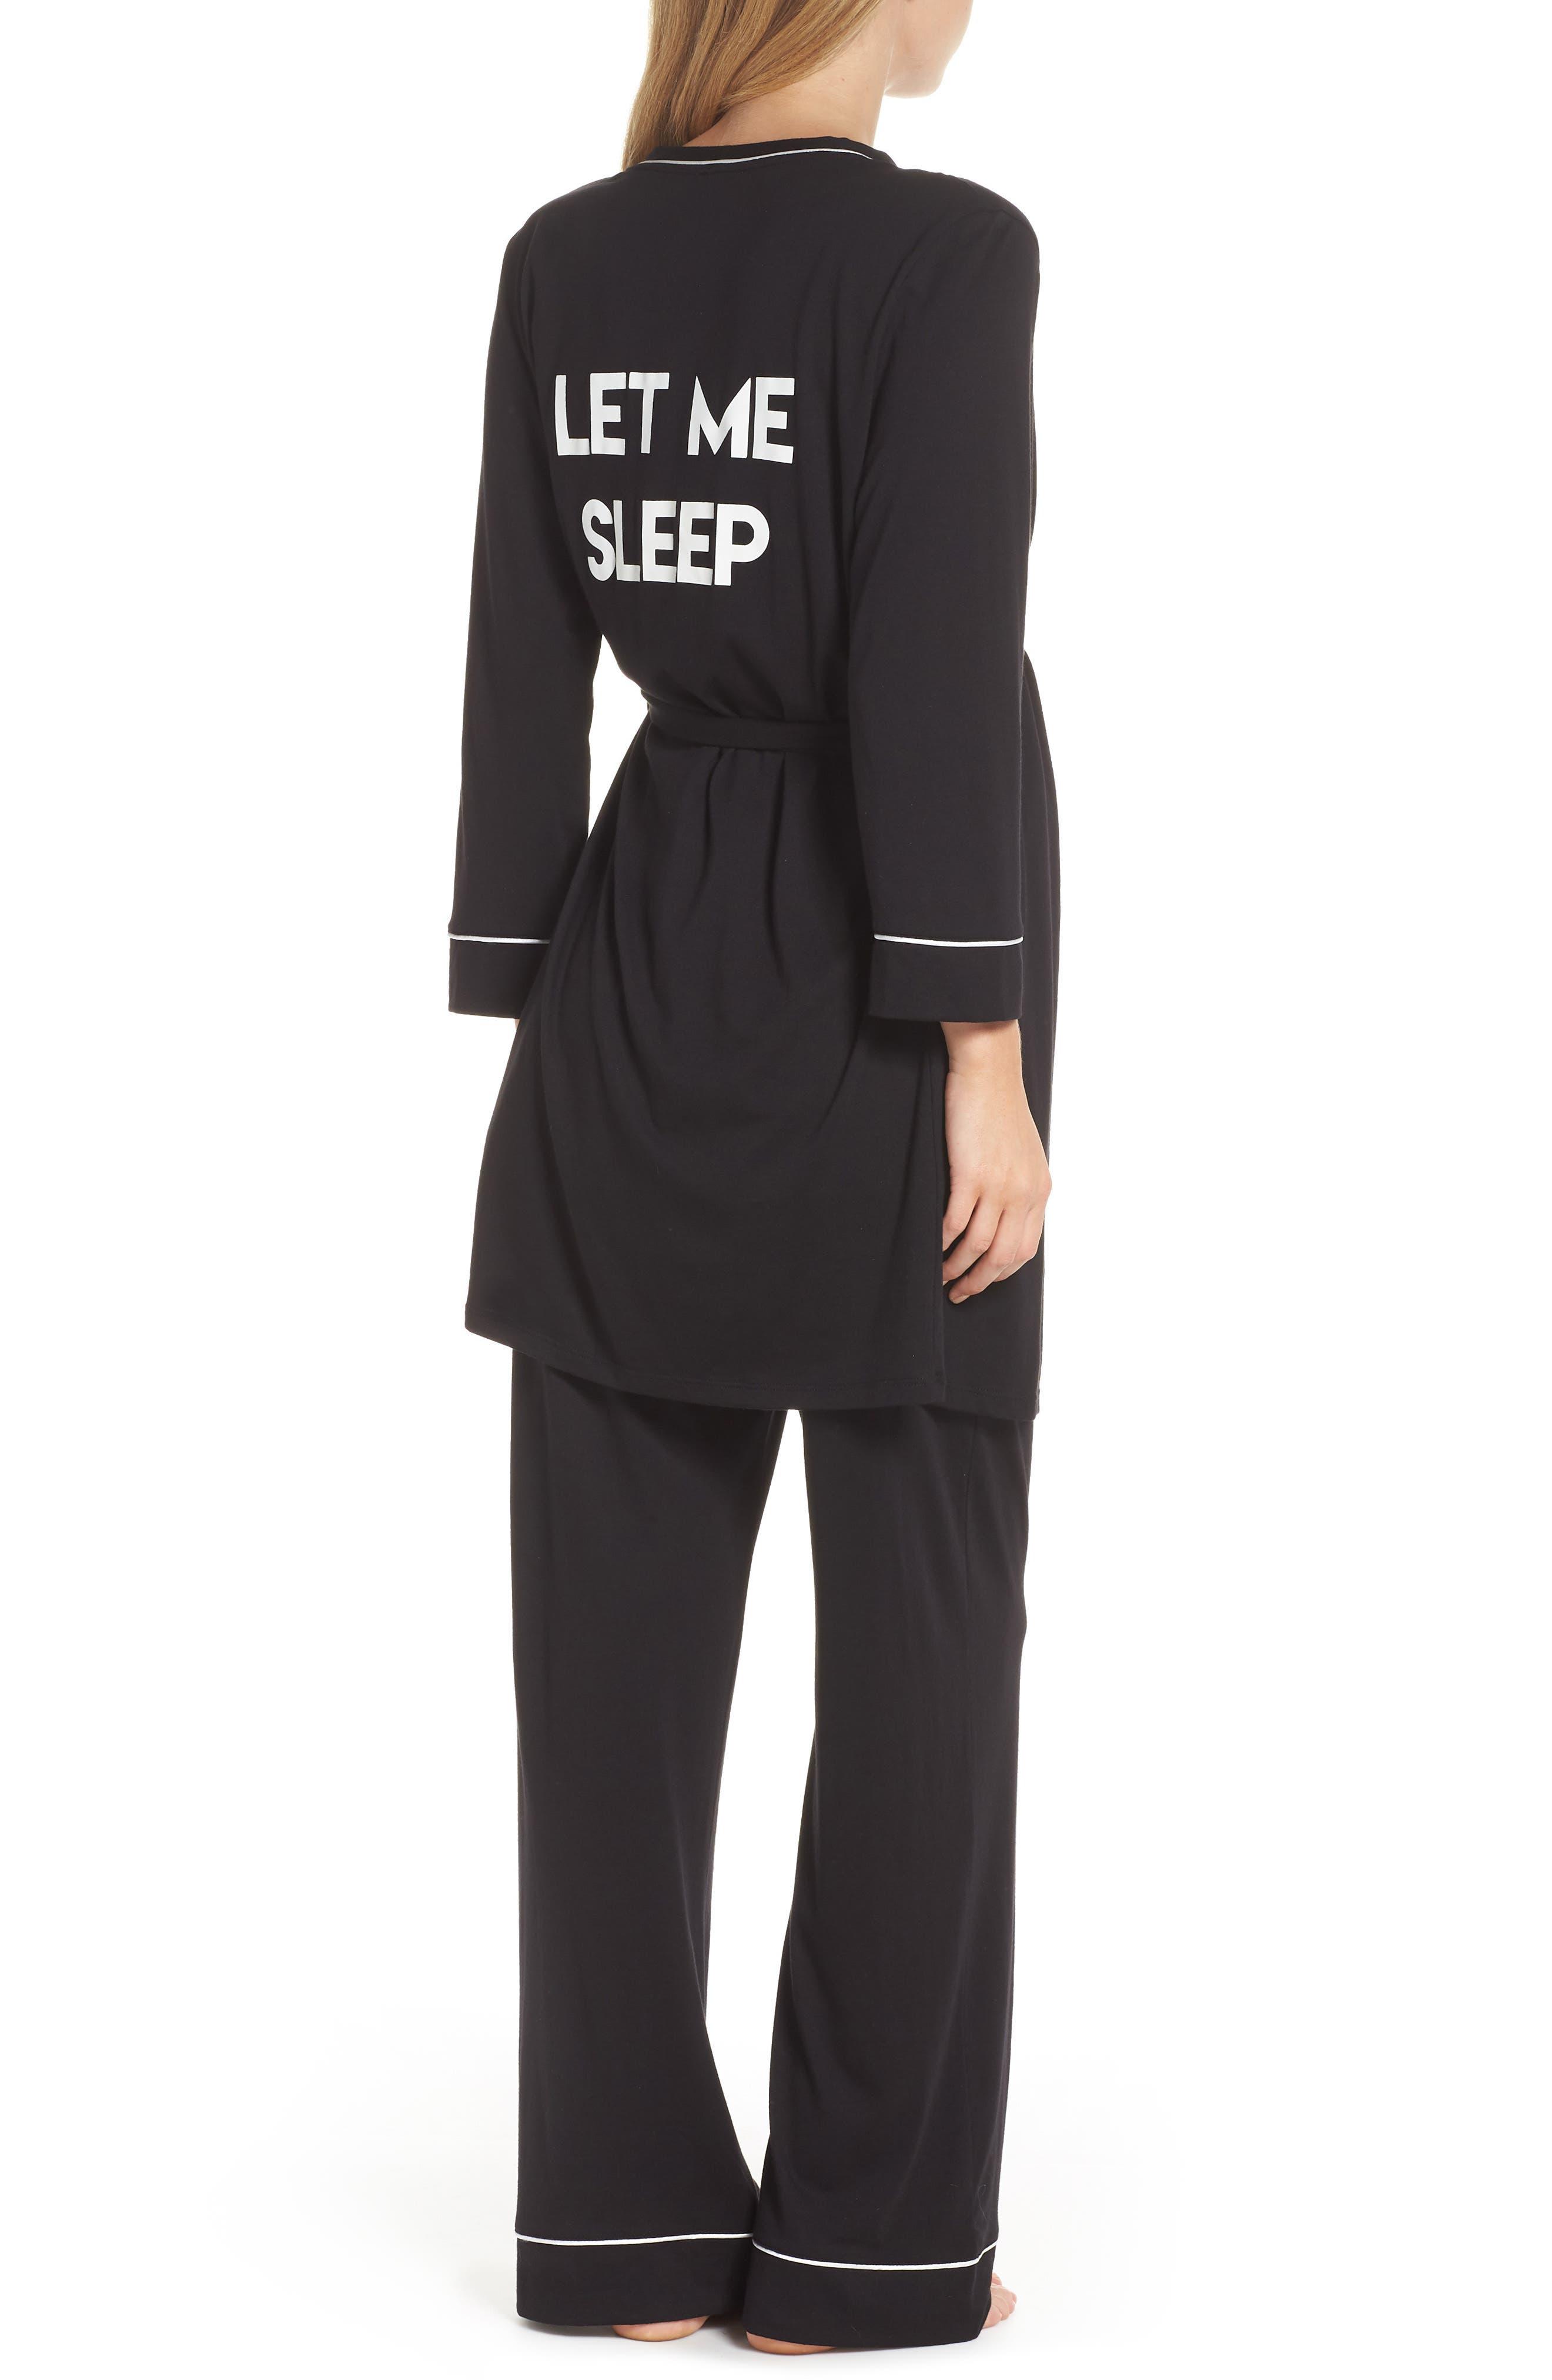 COSABELLA, Let Me Sleep Maternity/Nursing Pajamas & Robe Set, Alternate thumbnail 2, color, 013